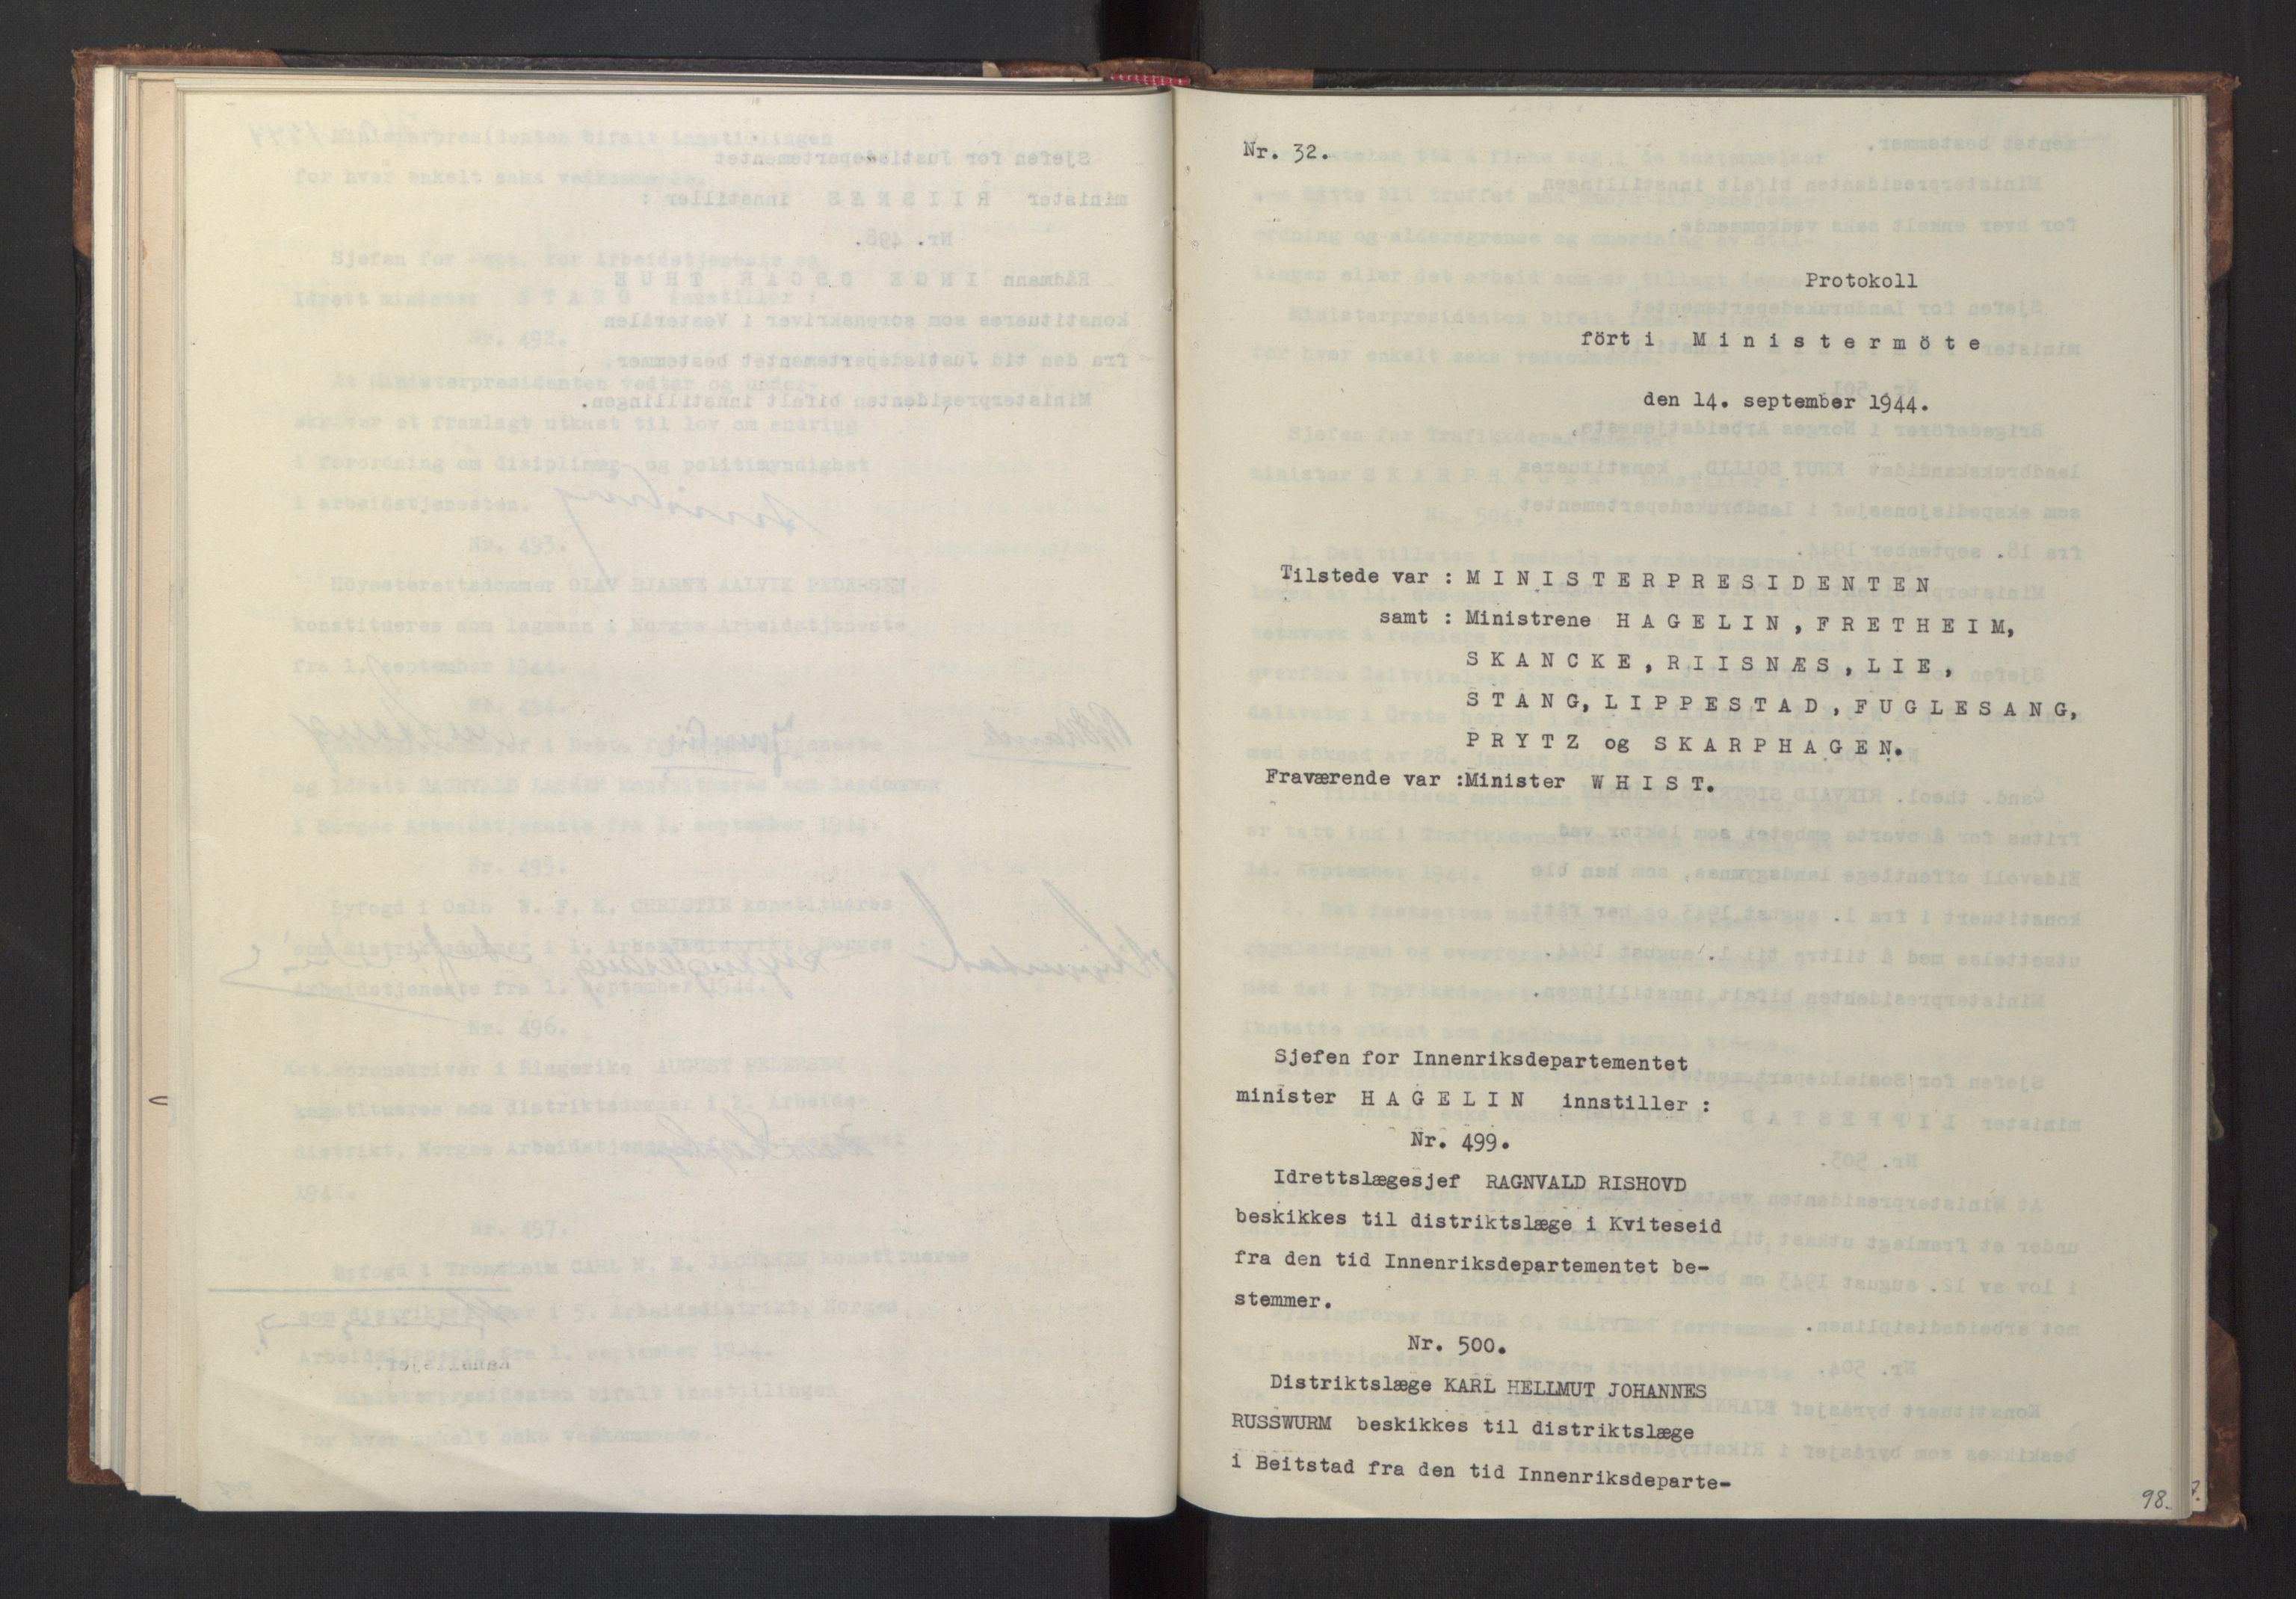 RA, NS-administrasjonen 1940-1945 (Statsrådsekretariatet, de kommisariske statsråder mm), D/Da/L0005: Protokoll fra ministermøter, 1944, s. 97b-98a